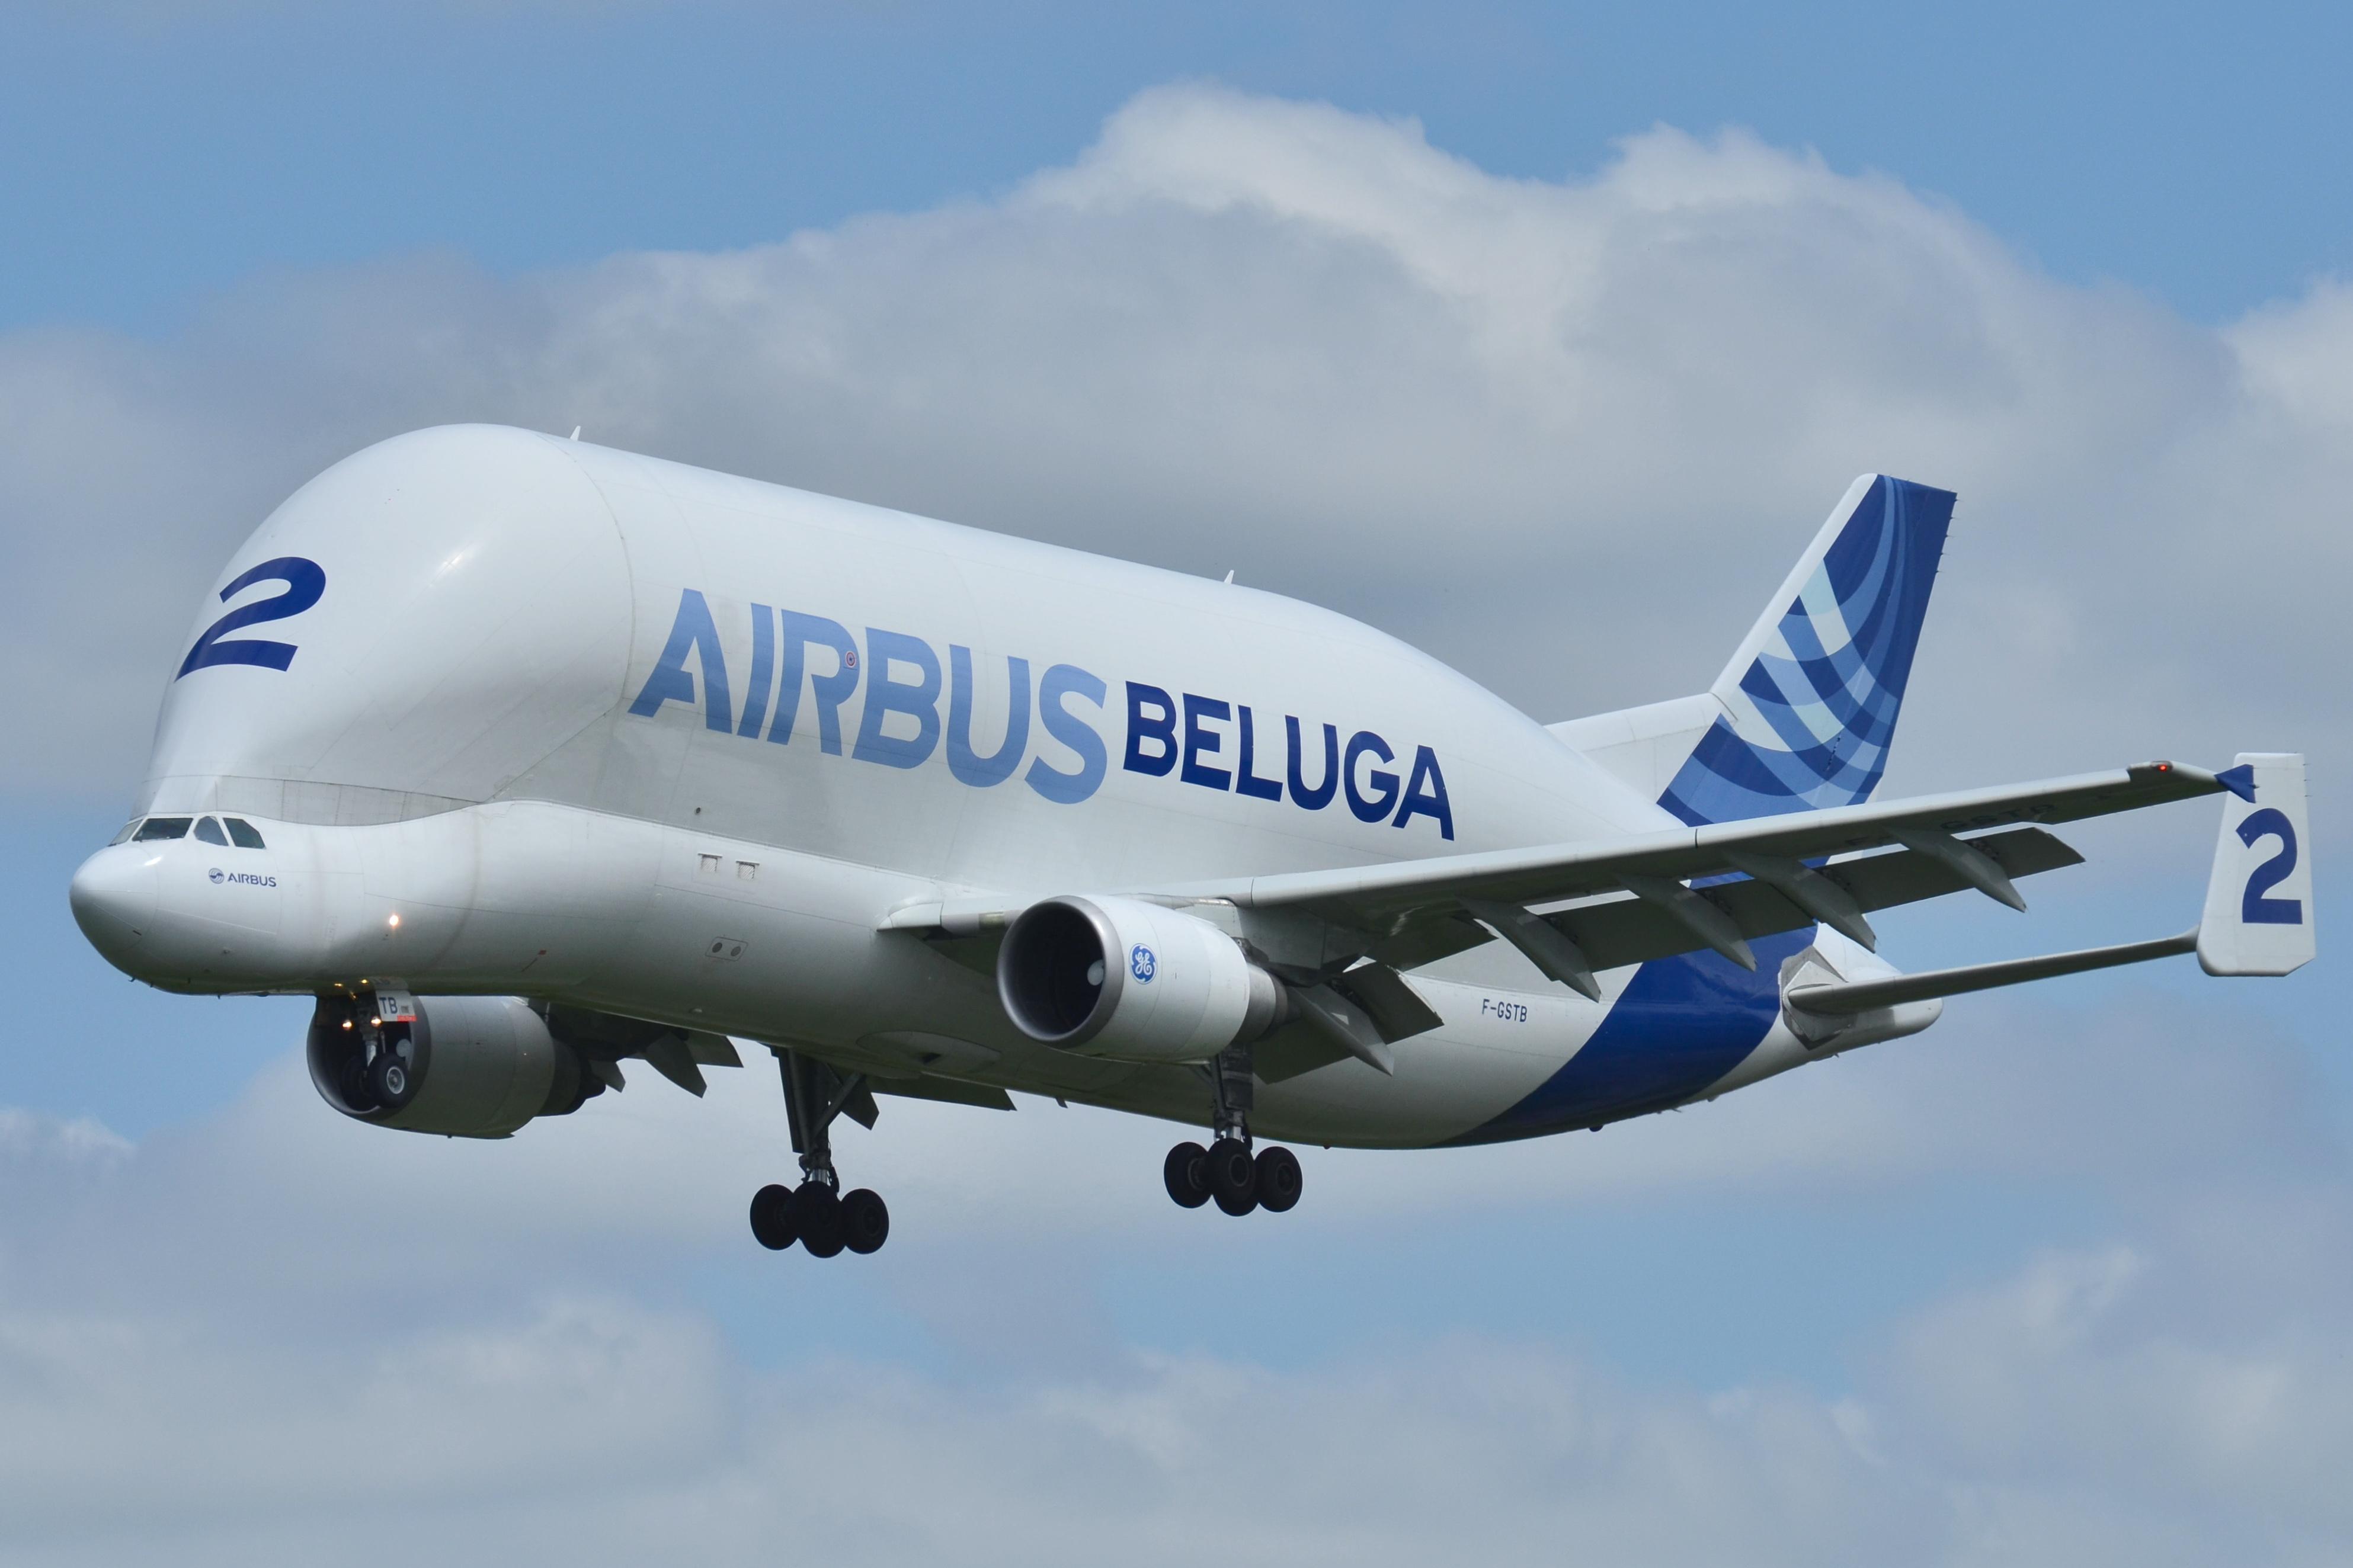 Airbus_A300-600ST_Airbus_Industries_(AIB)_Beluga_2_F-GSTB_-_MSN_751_(9738916989)